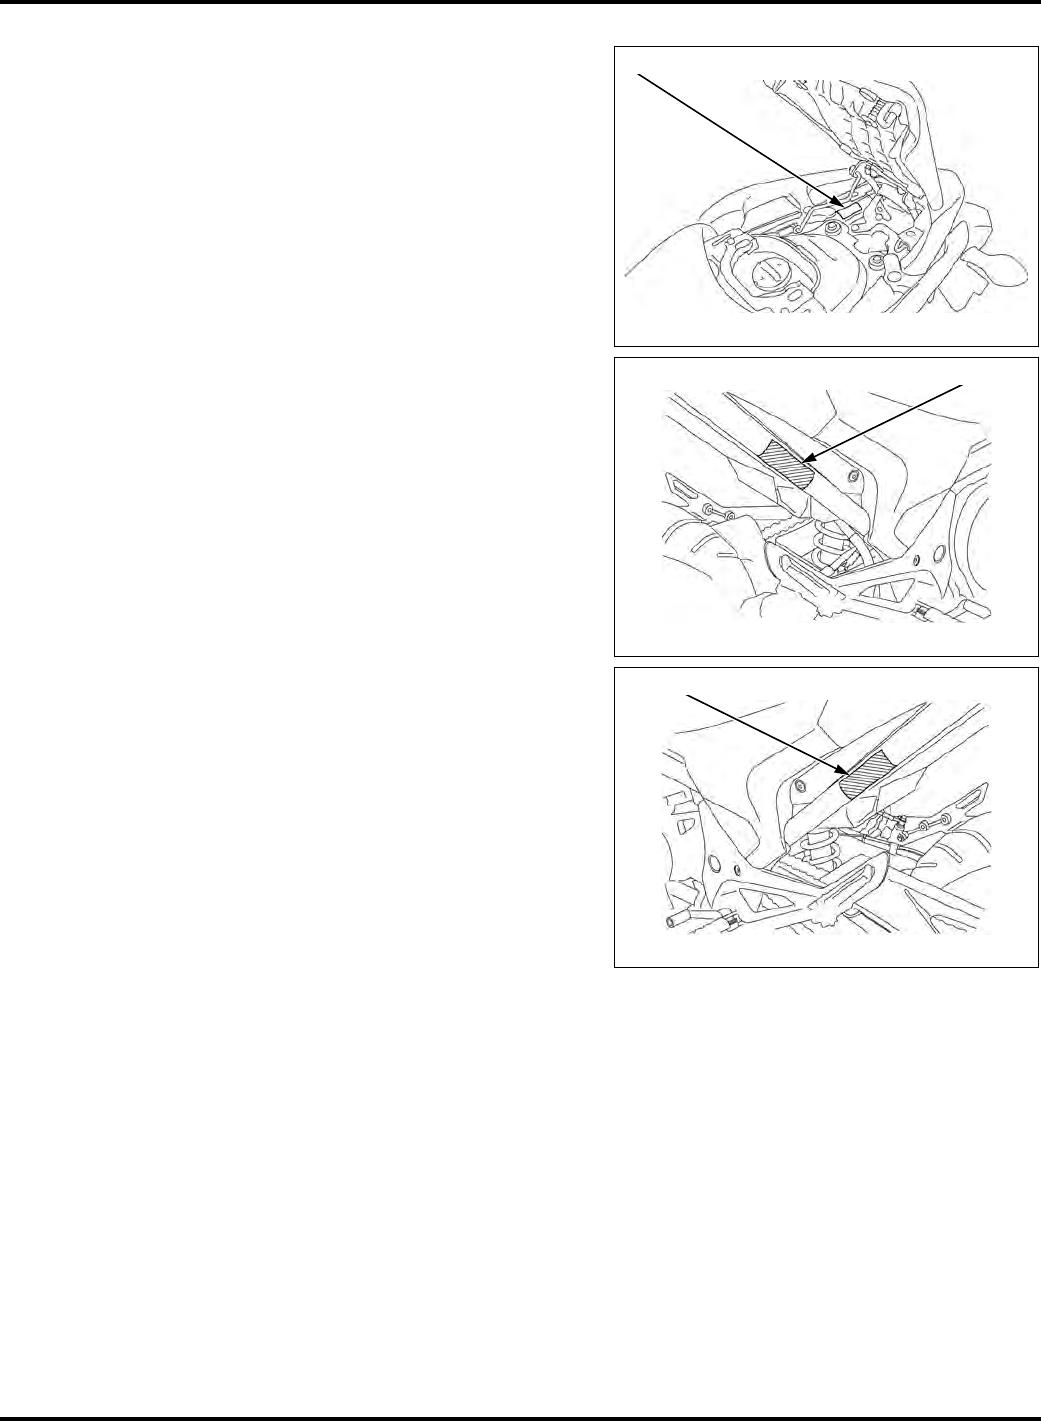 handleiding honda nc 700 pagina 7 van 773 english Honda 700Nc 1 5